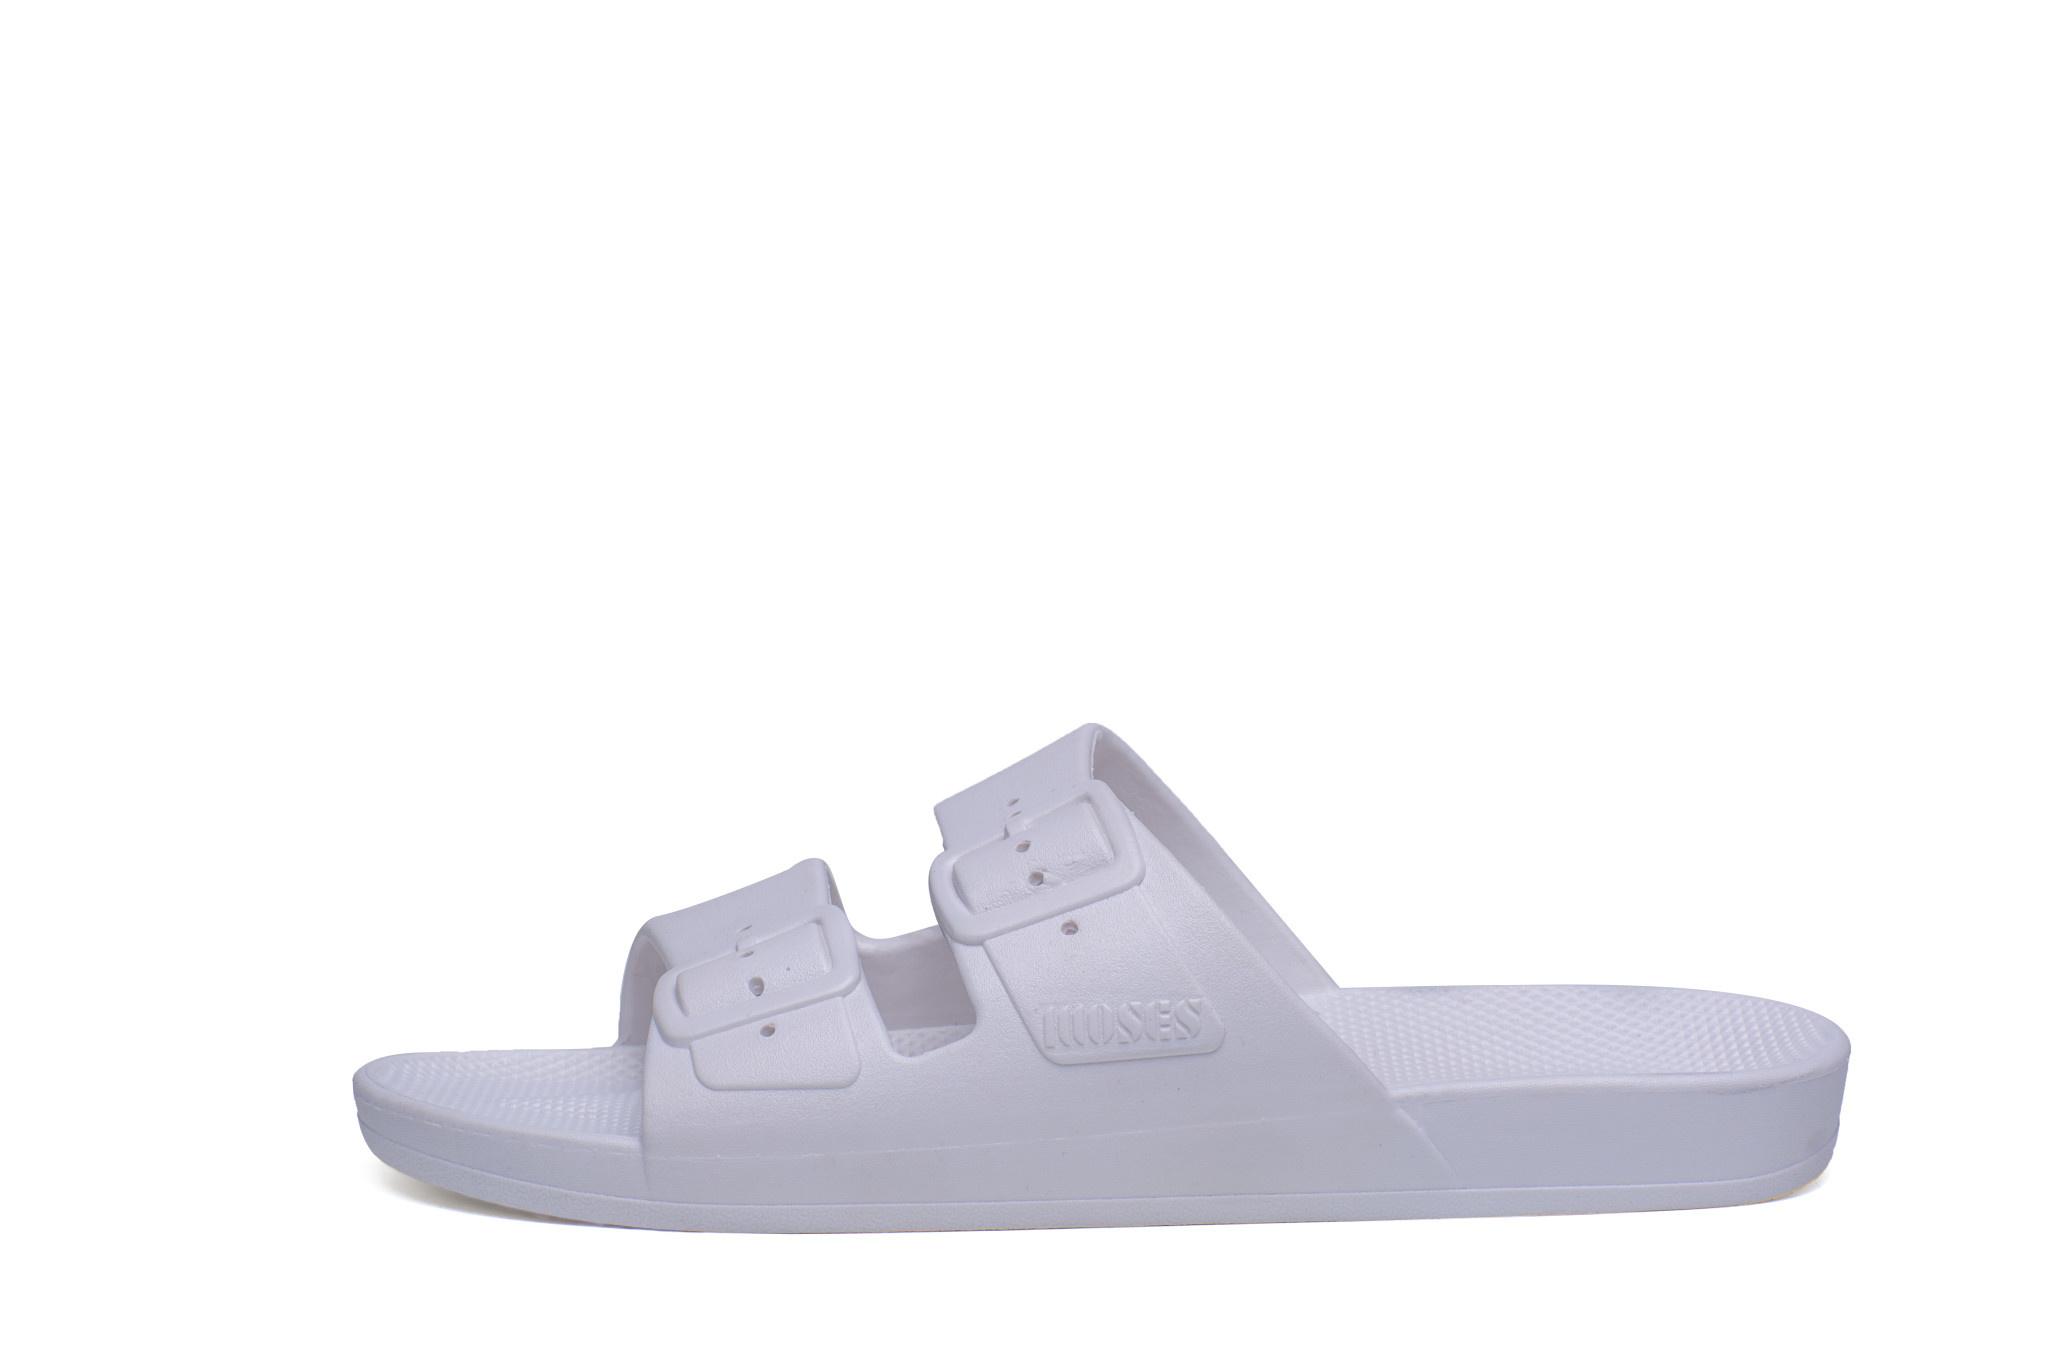 Freedom MOSES White Basic Kids Sandals